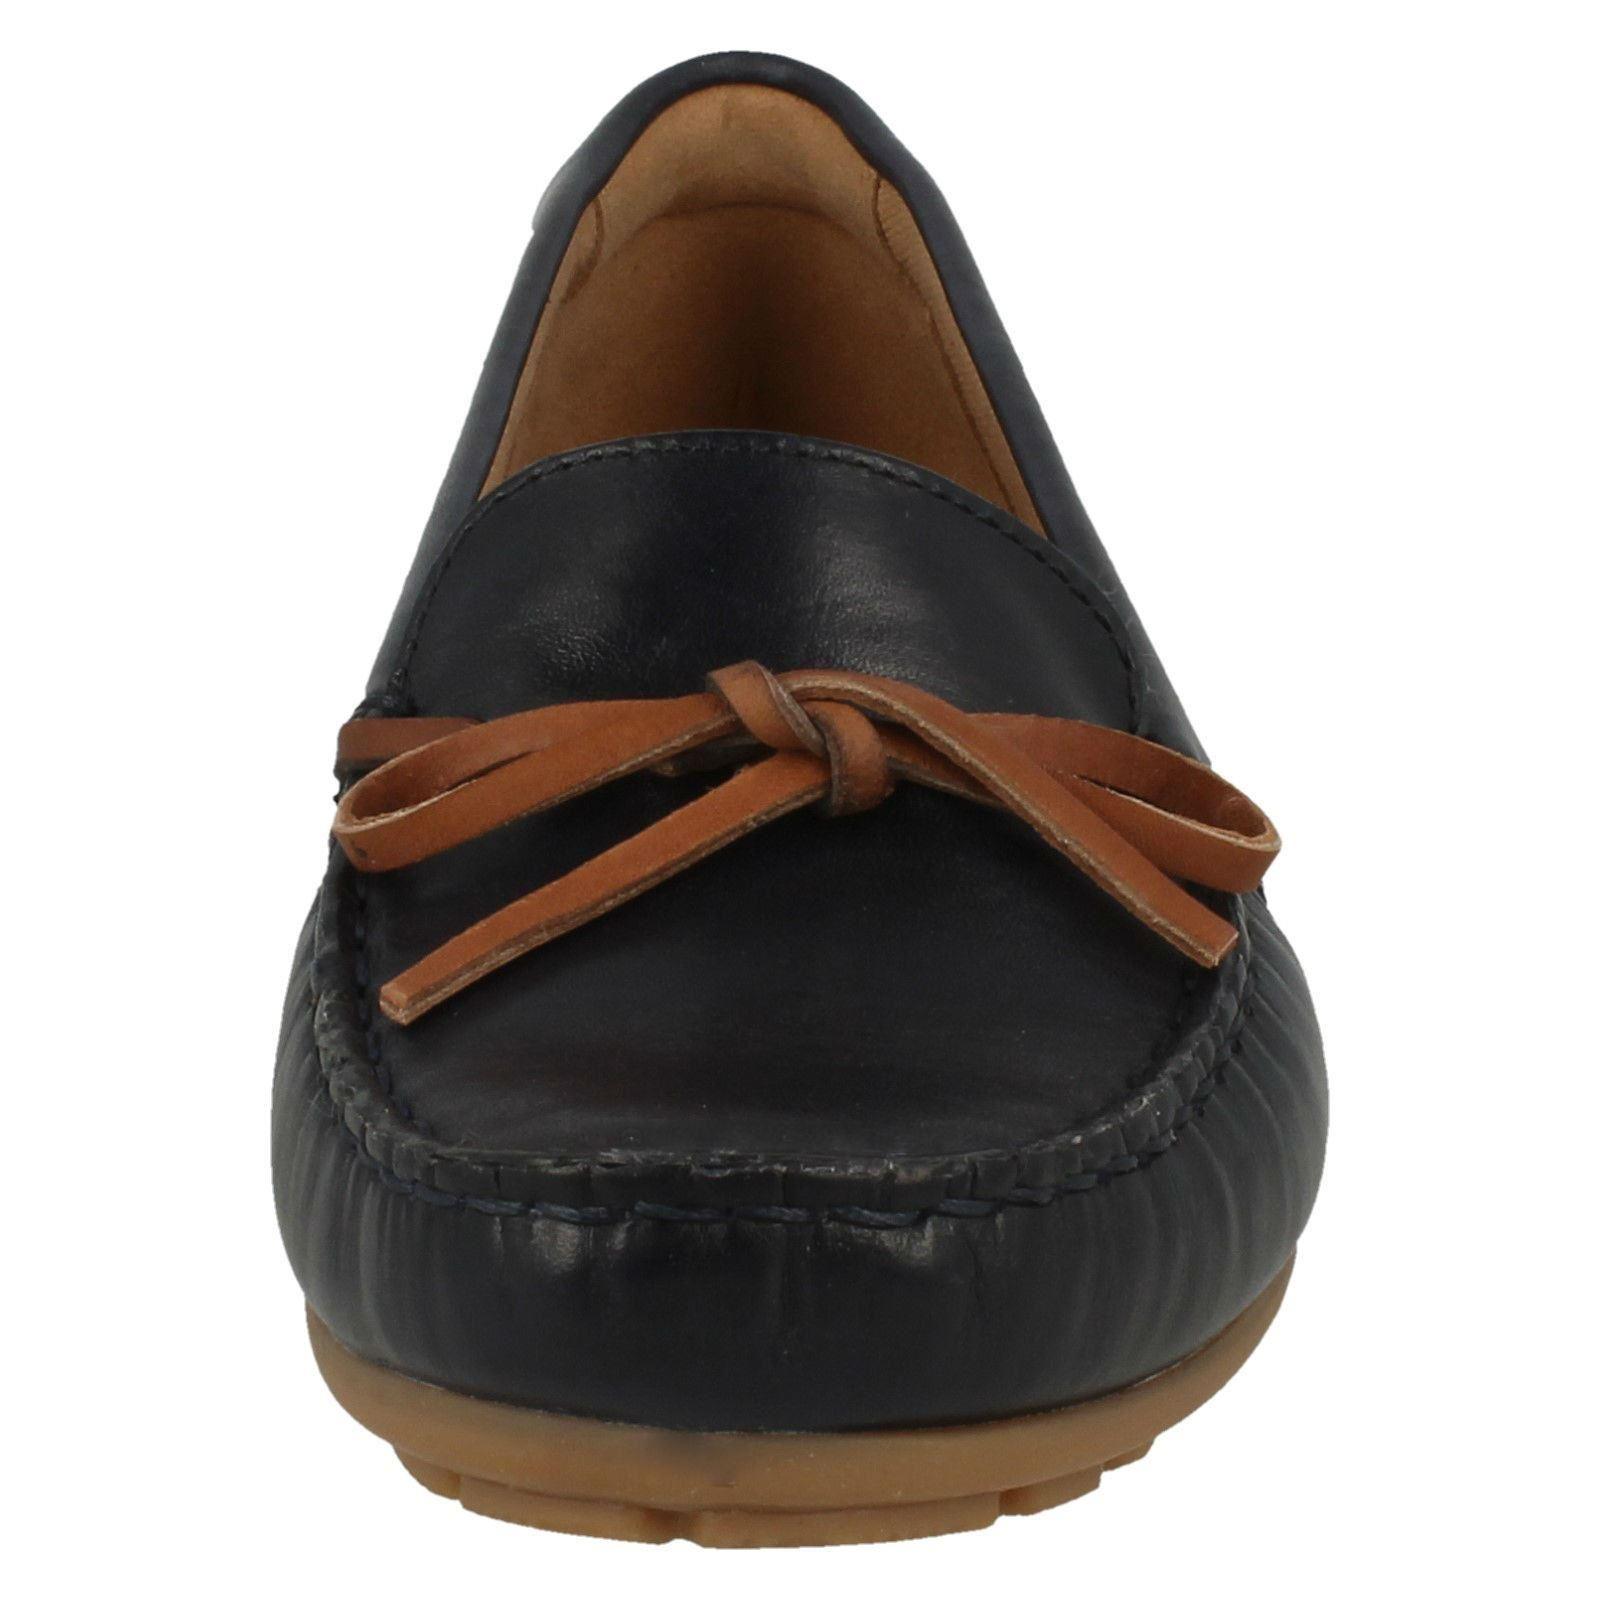 Mujer Estilo Dameo Clarks Swing Zapatos Mocasín PfFZT